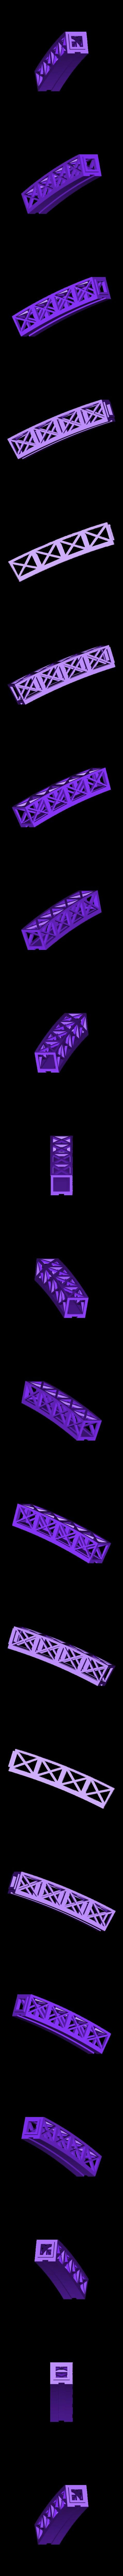 SEG_E-6.stl Download free STL file LED bridge lamp • Model to 3D print, Opossums